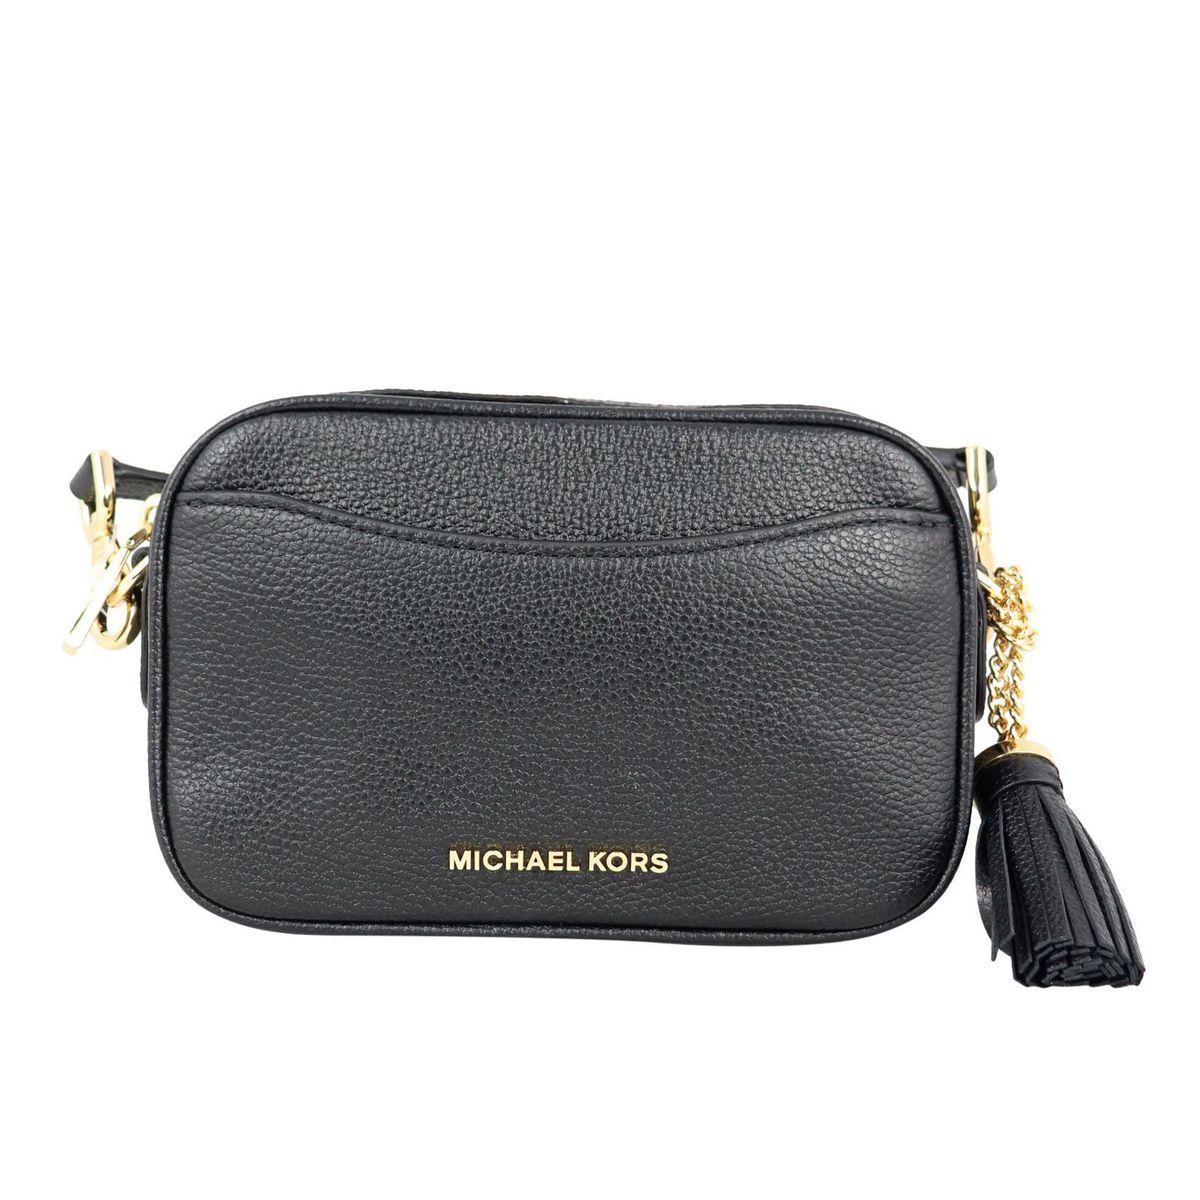 Convertible shoulder bag in textured leather Black Michael Kors